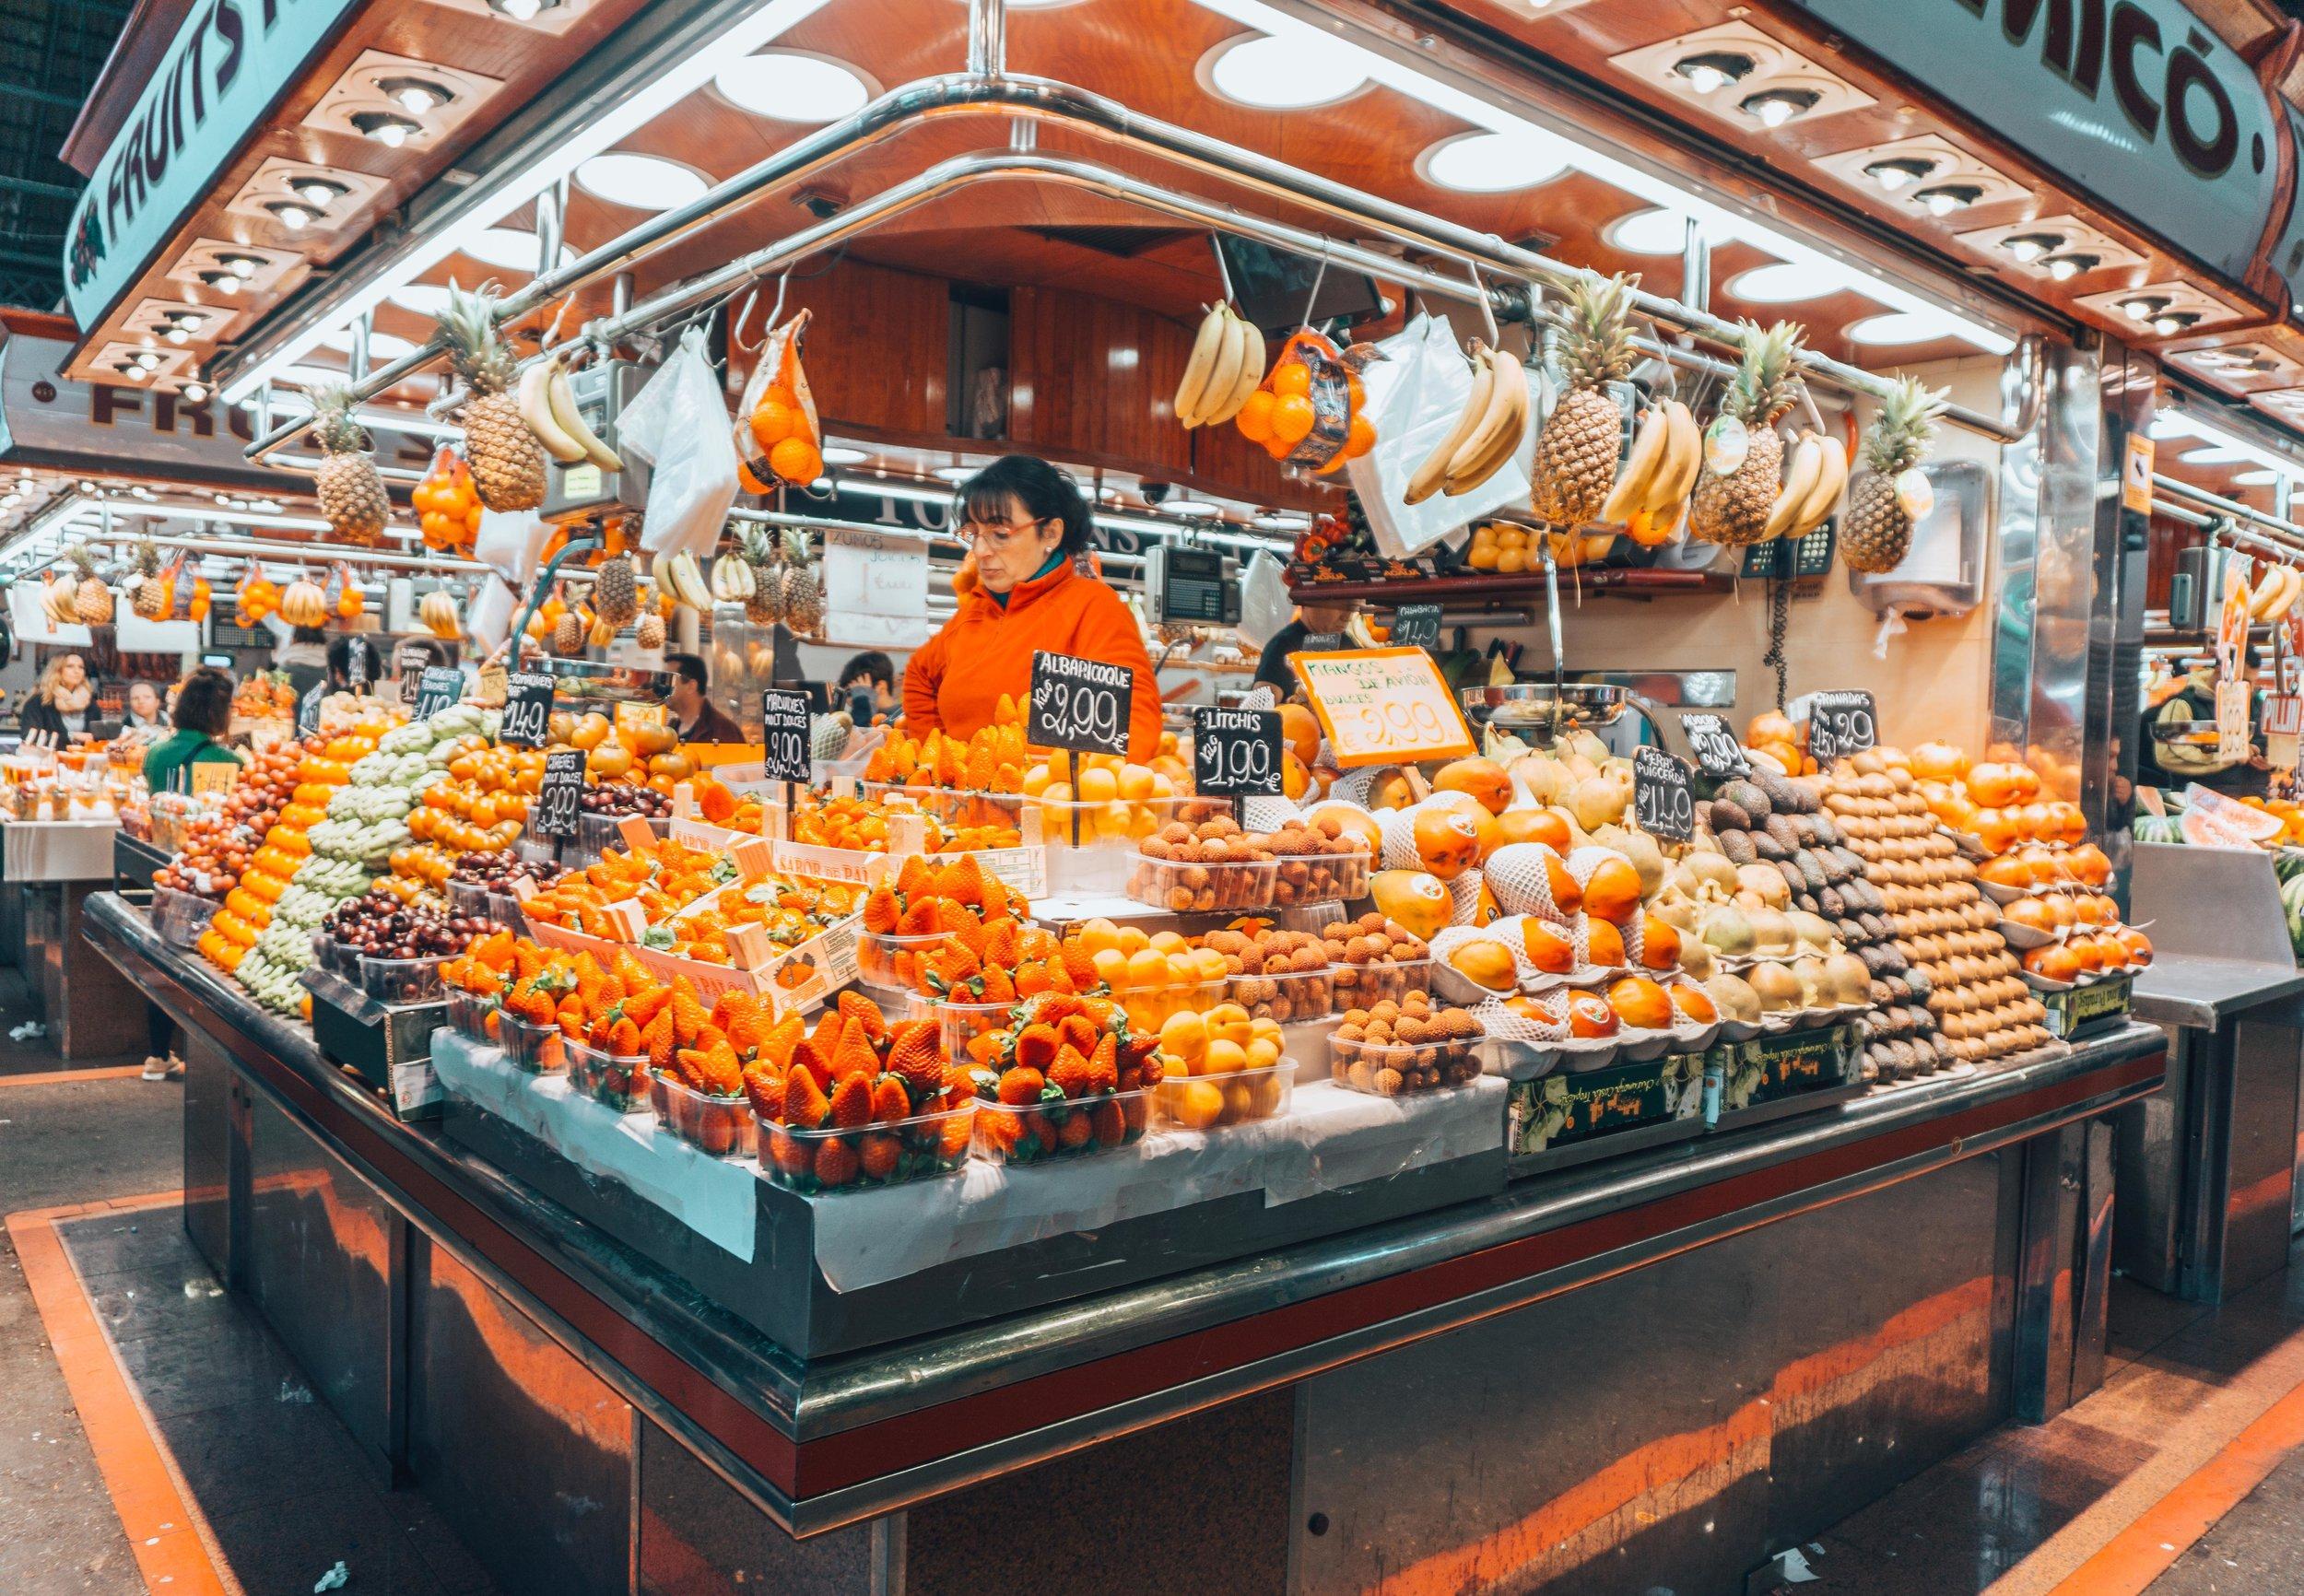 La Boqueria Market, Barcelona - A Foodie's Paradise